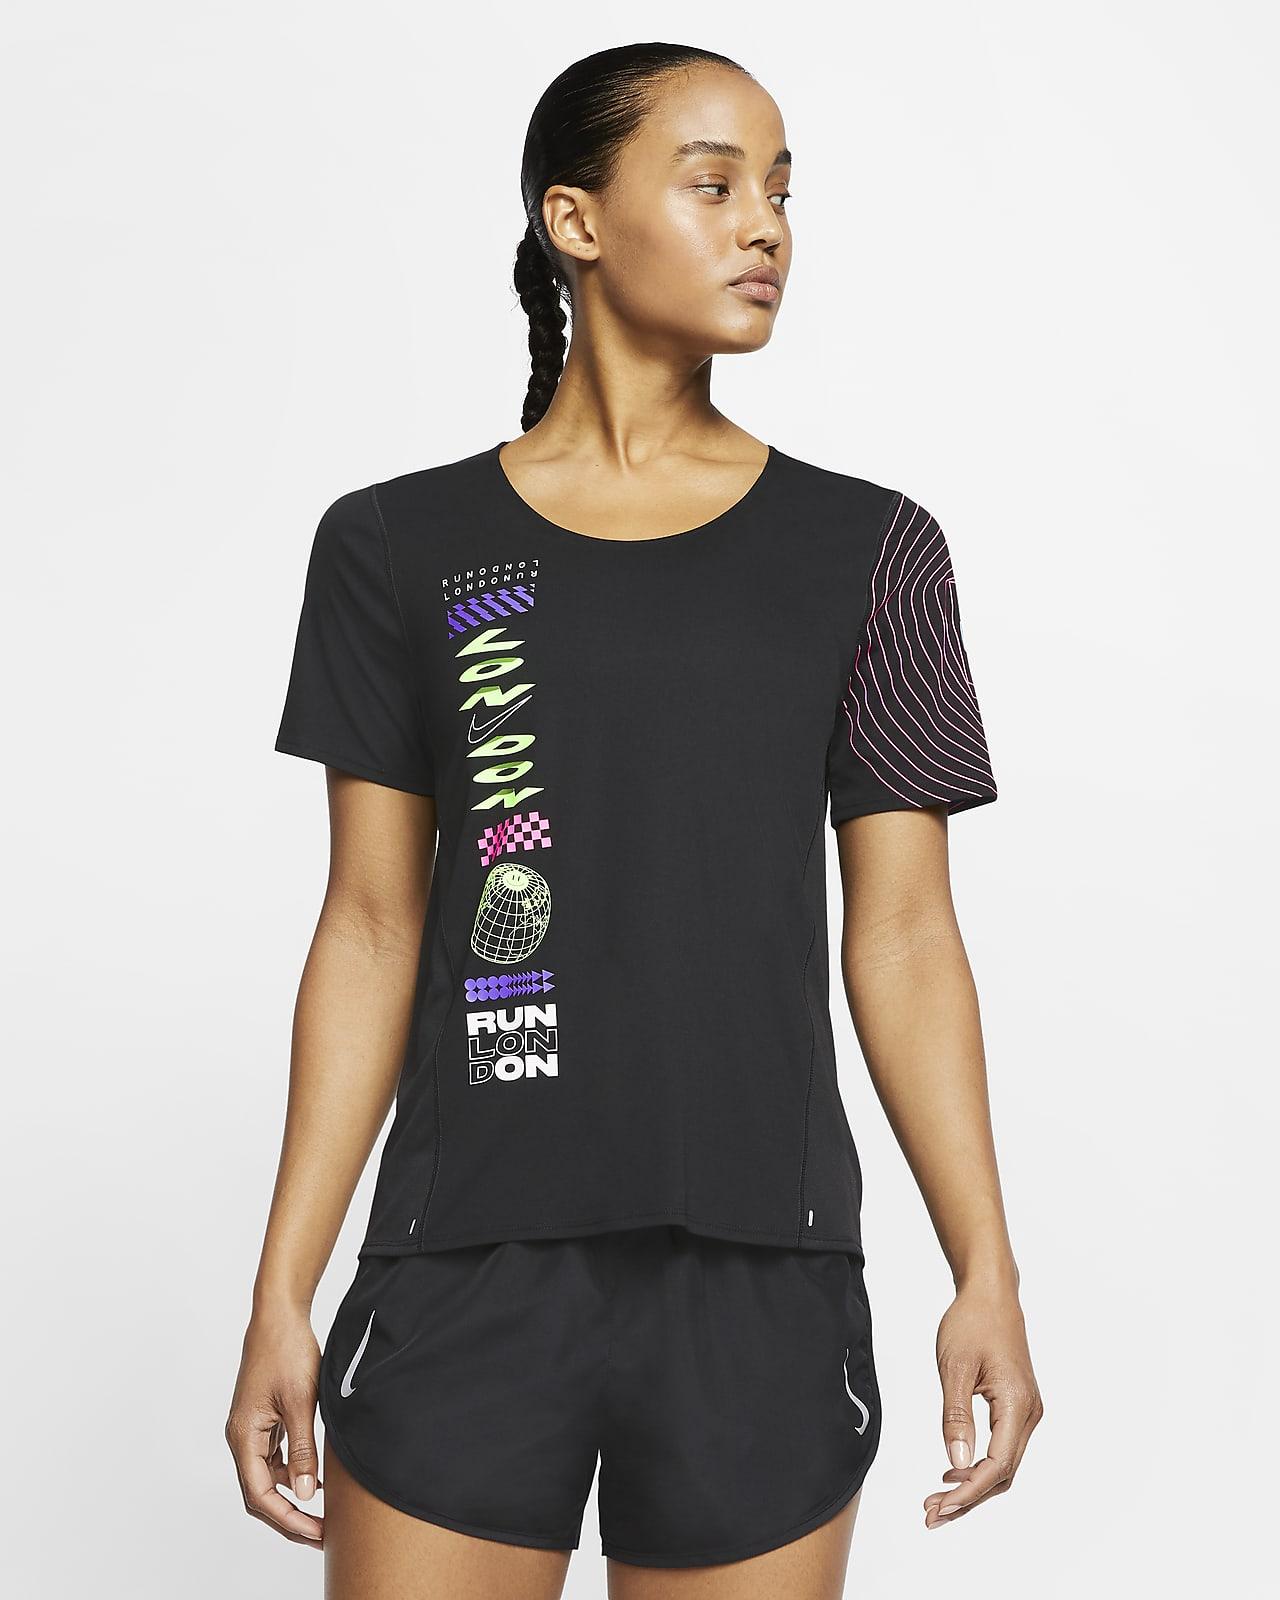 Nike City Sleek London Women's Short-Sleeve Running Top